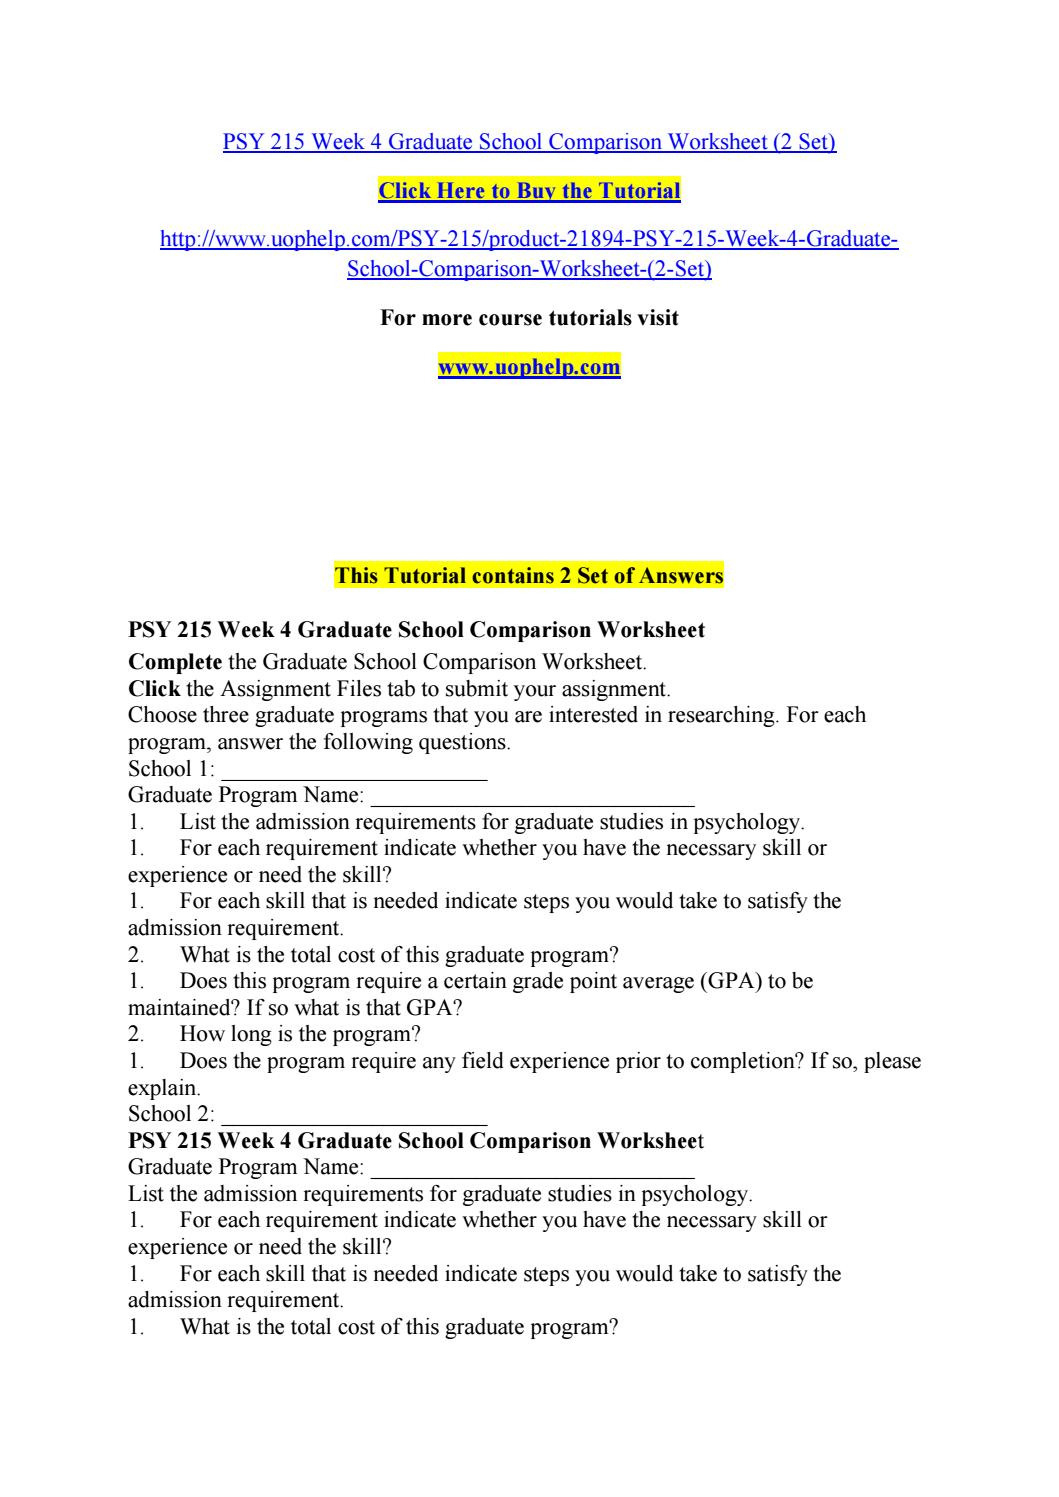 Psy 215 Week 4 Graduate School Comparison Worksheet 2 Set